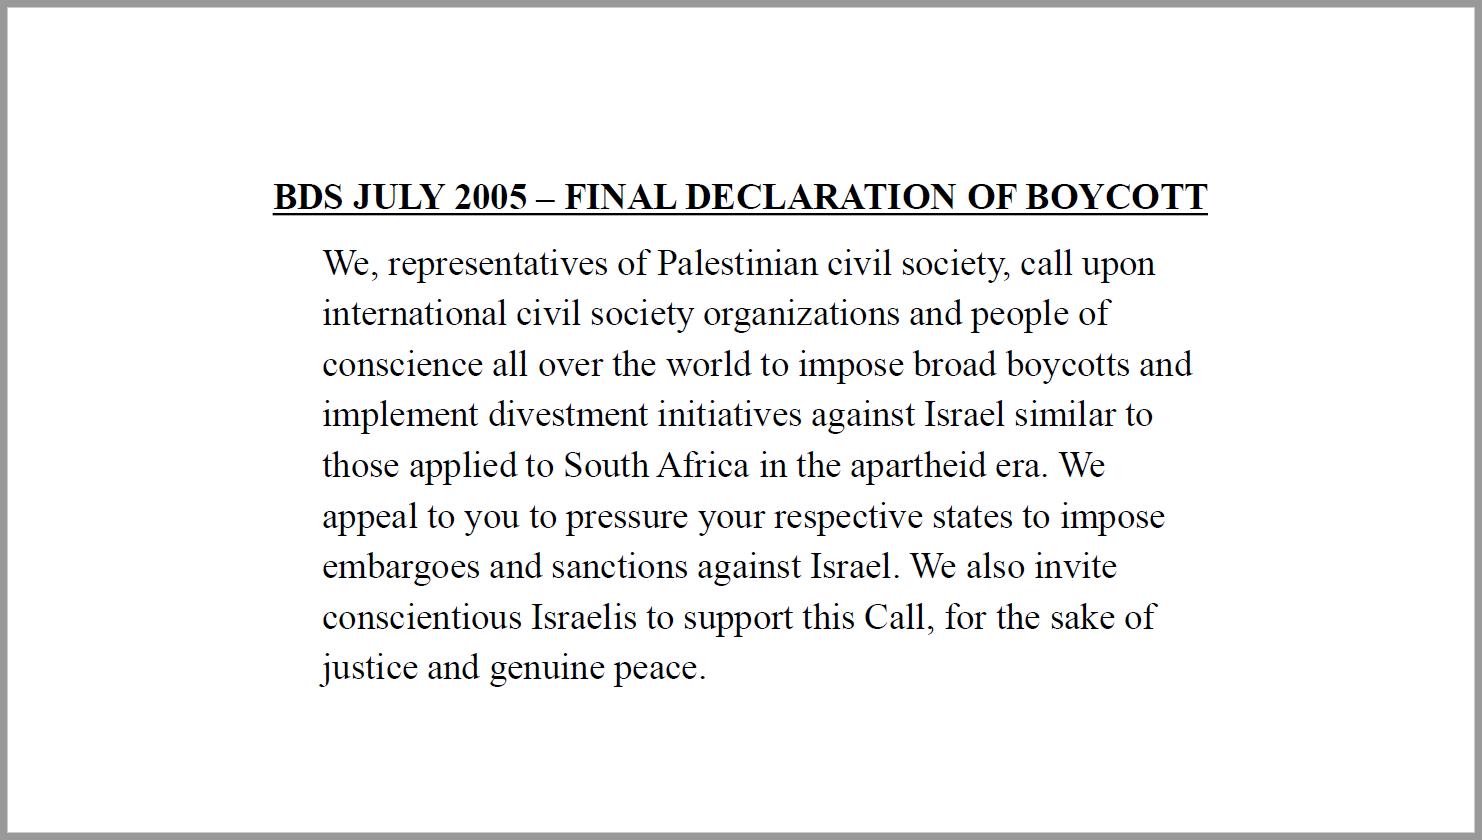 bds-history-july-2005-final-boycott-call